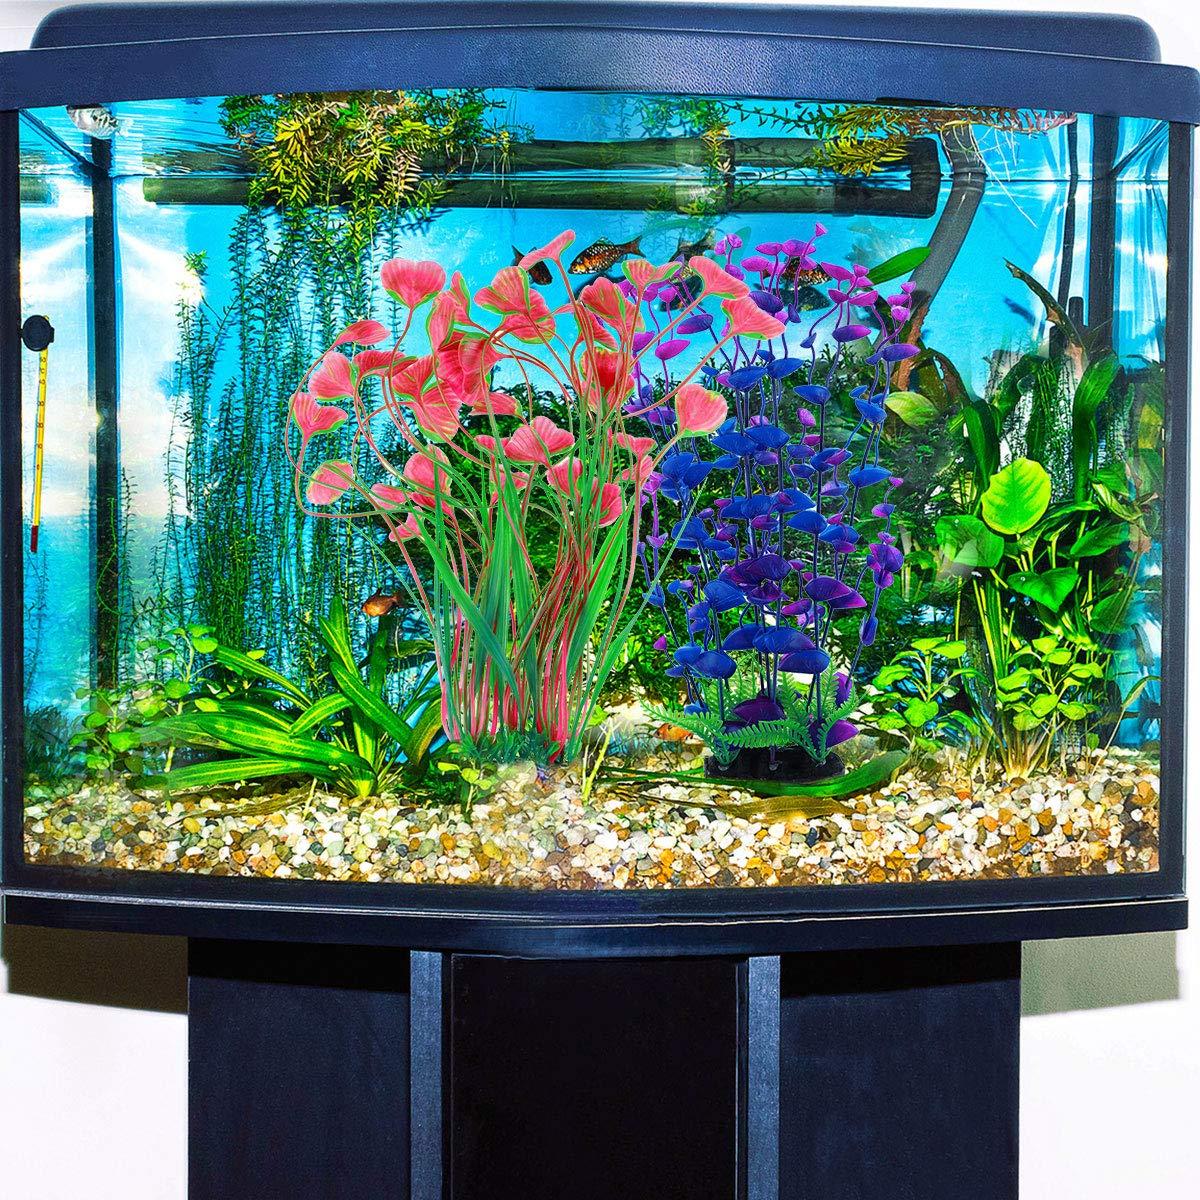 POPETPOP 2 Pack Artificial Aquarium Plants Underwater Eco-Friendly D/écor Plastic Aquarium Underwater Plants Fish Tank Decorations Pink and Purple